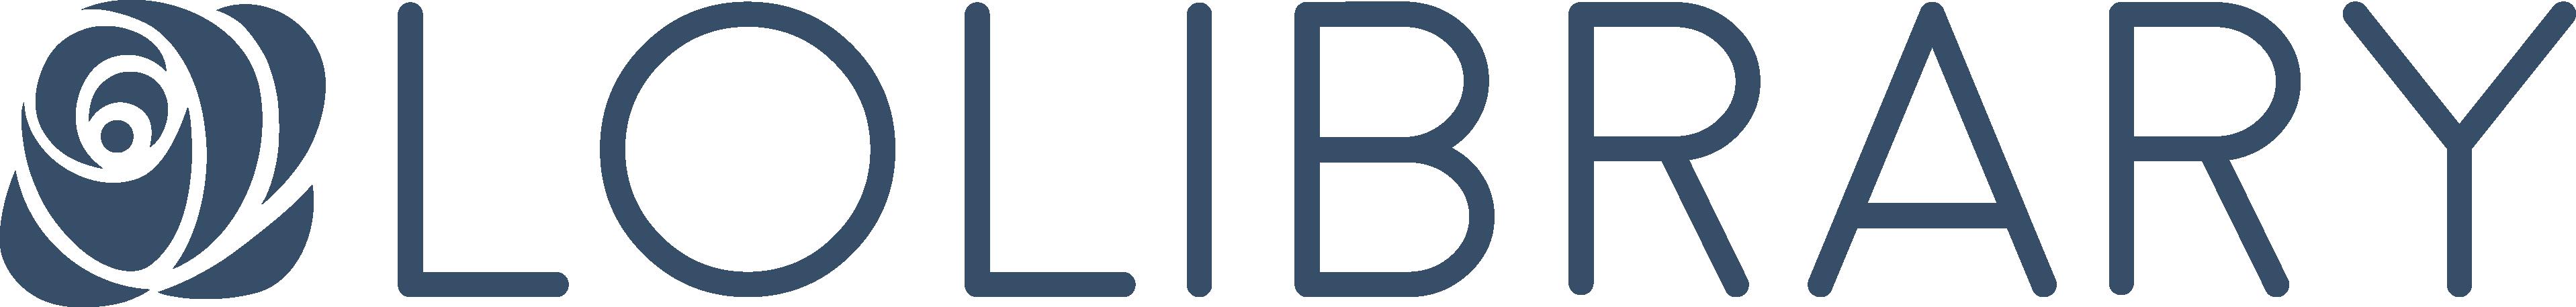 Lolibrary logo